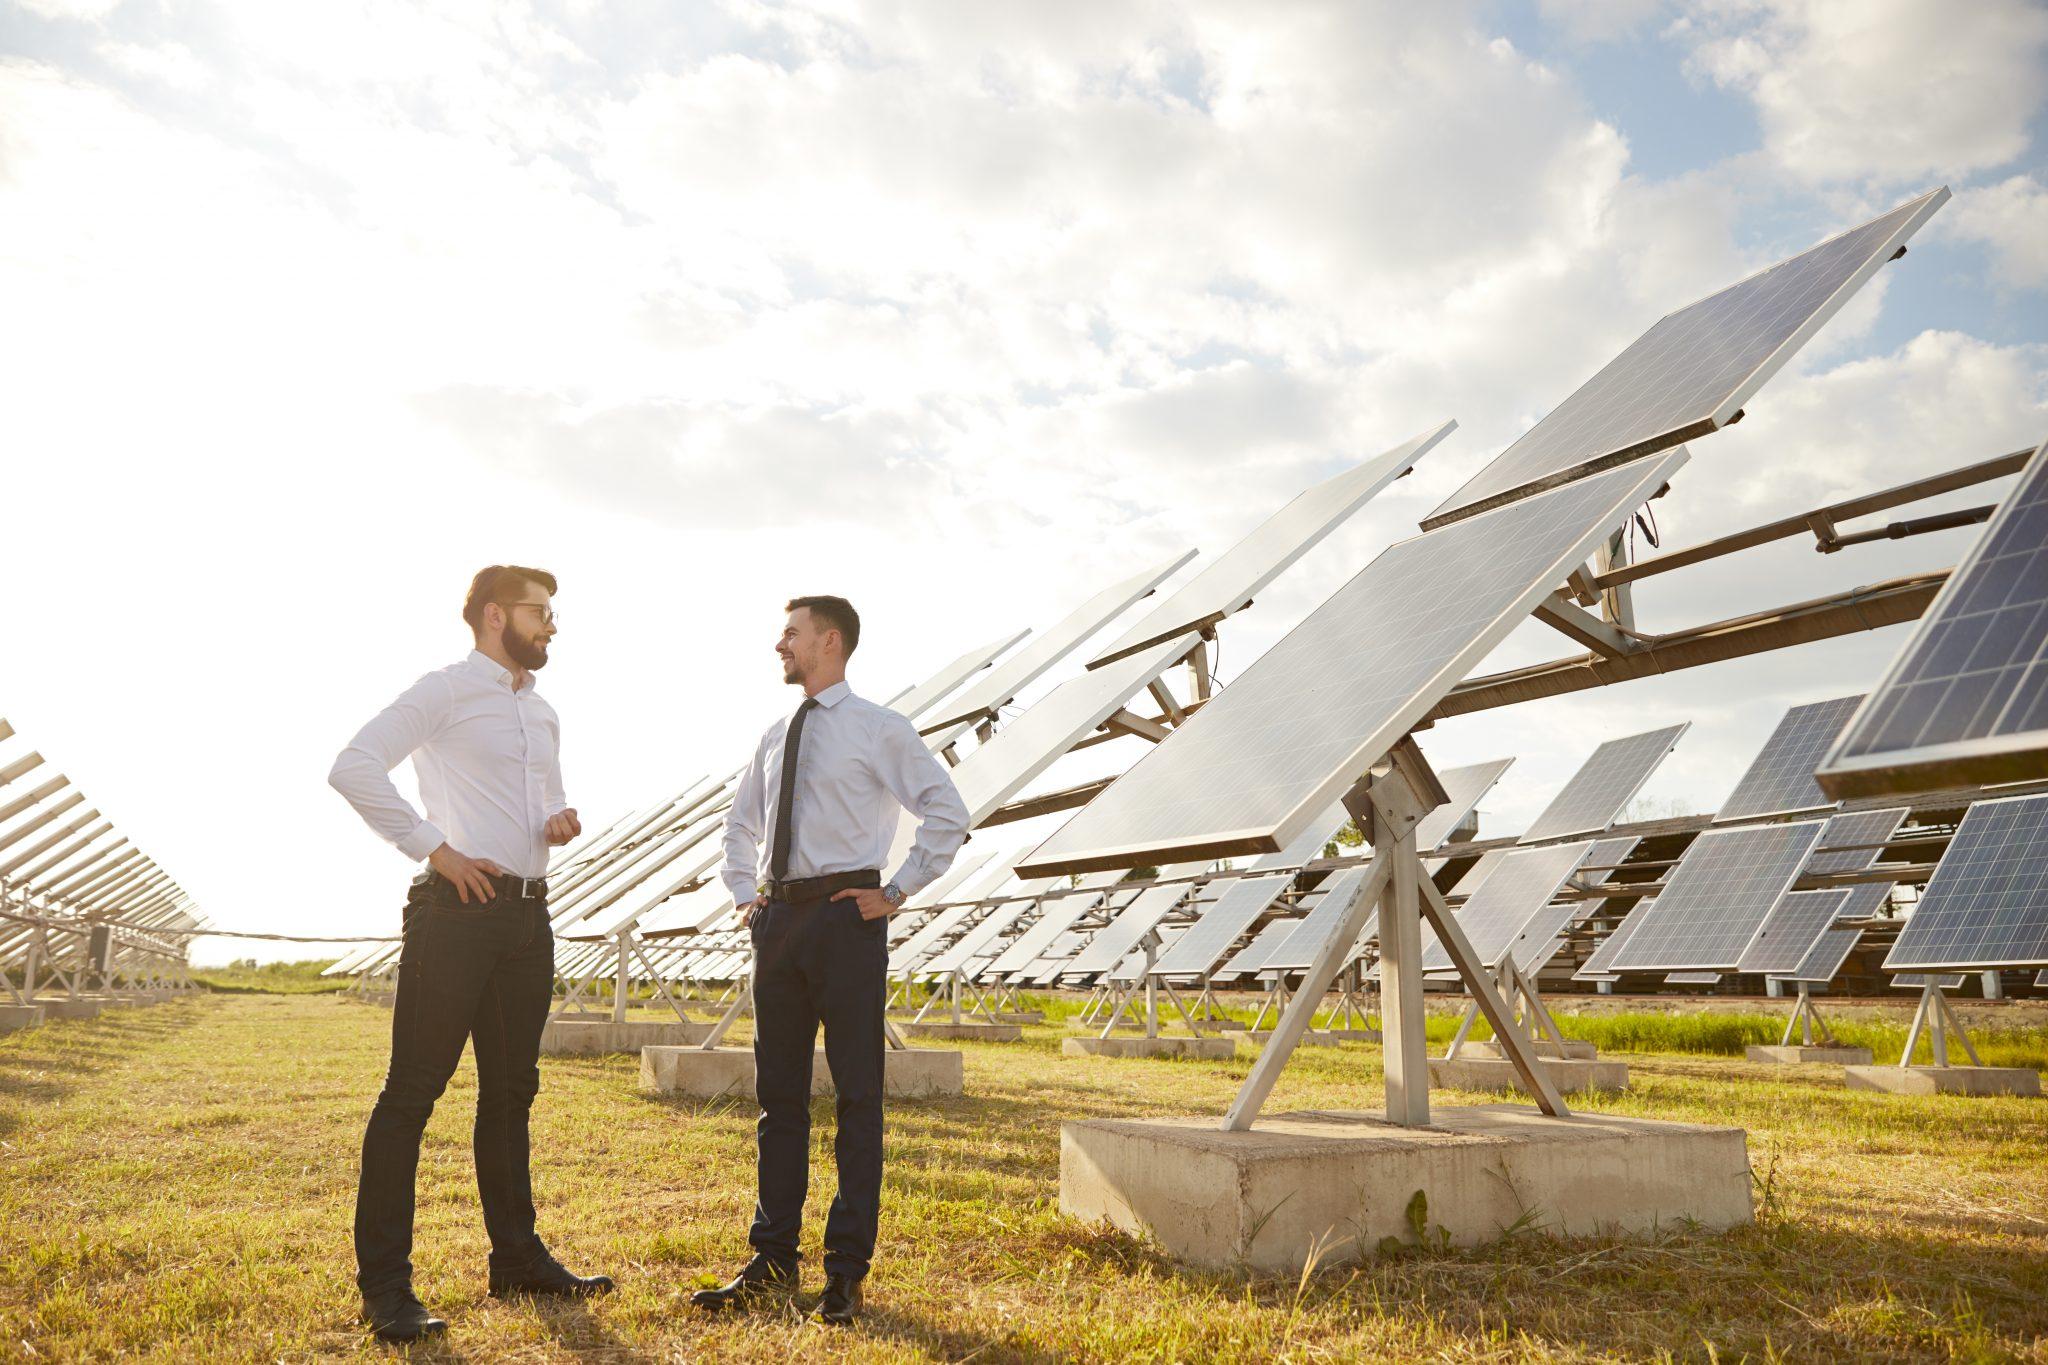 Two men talking about bifacial solar panels